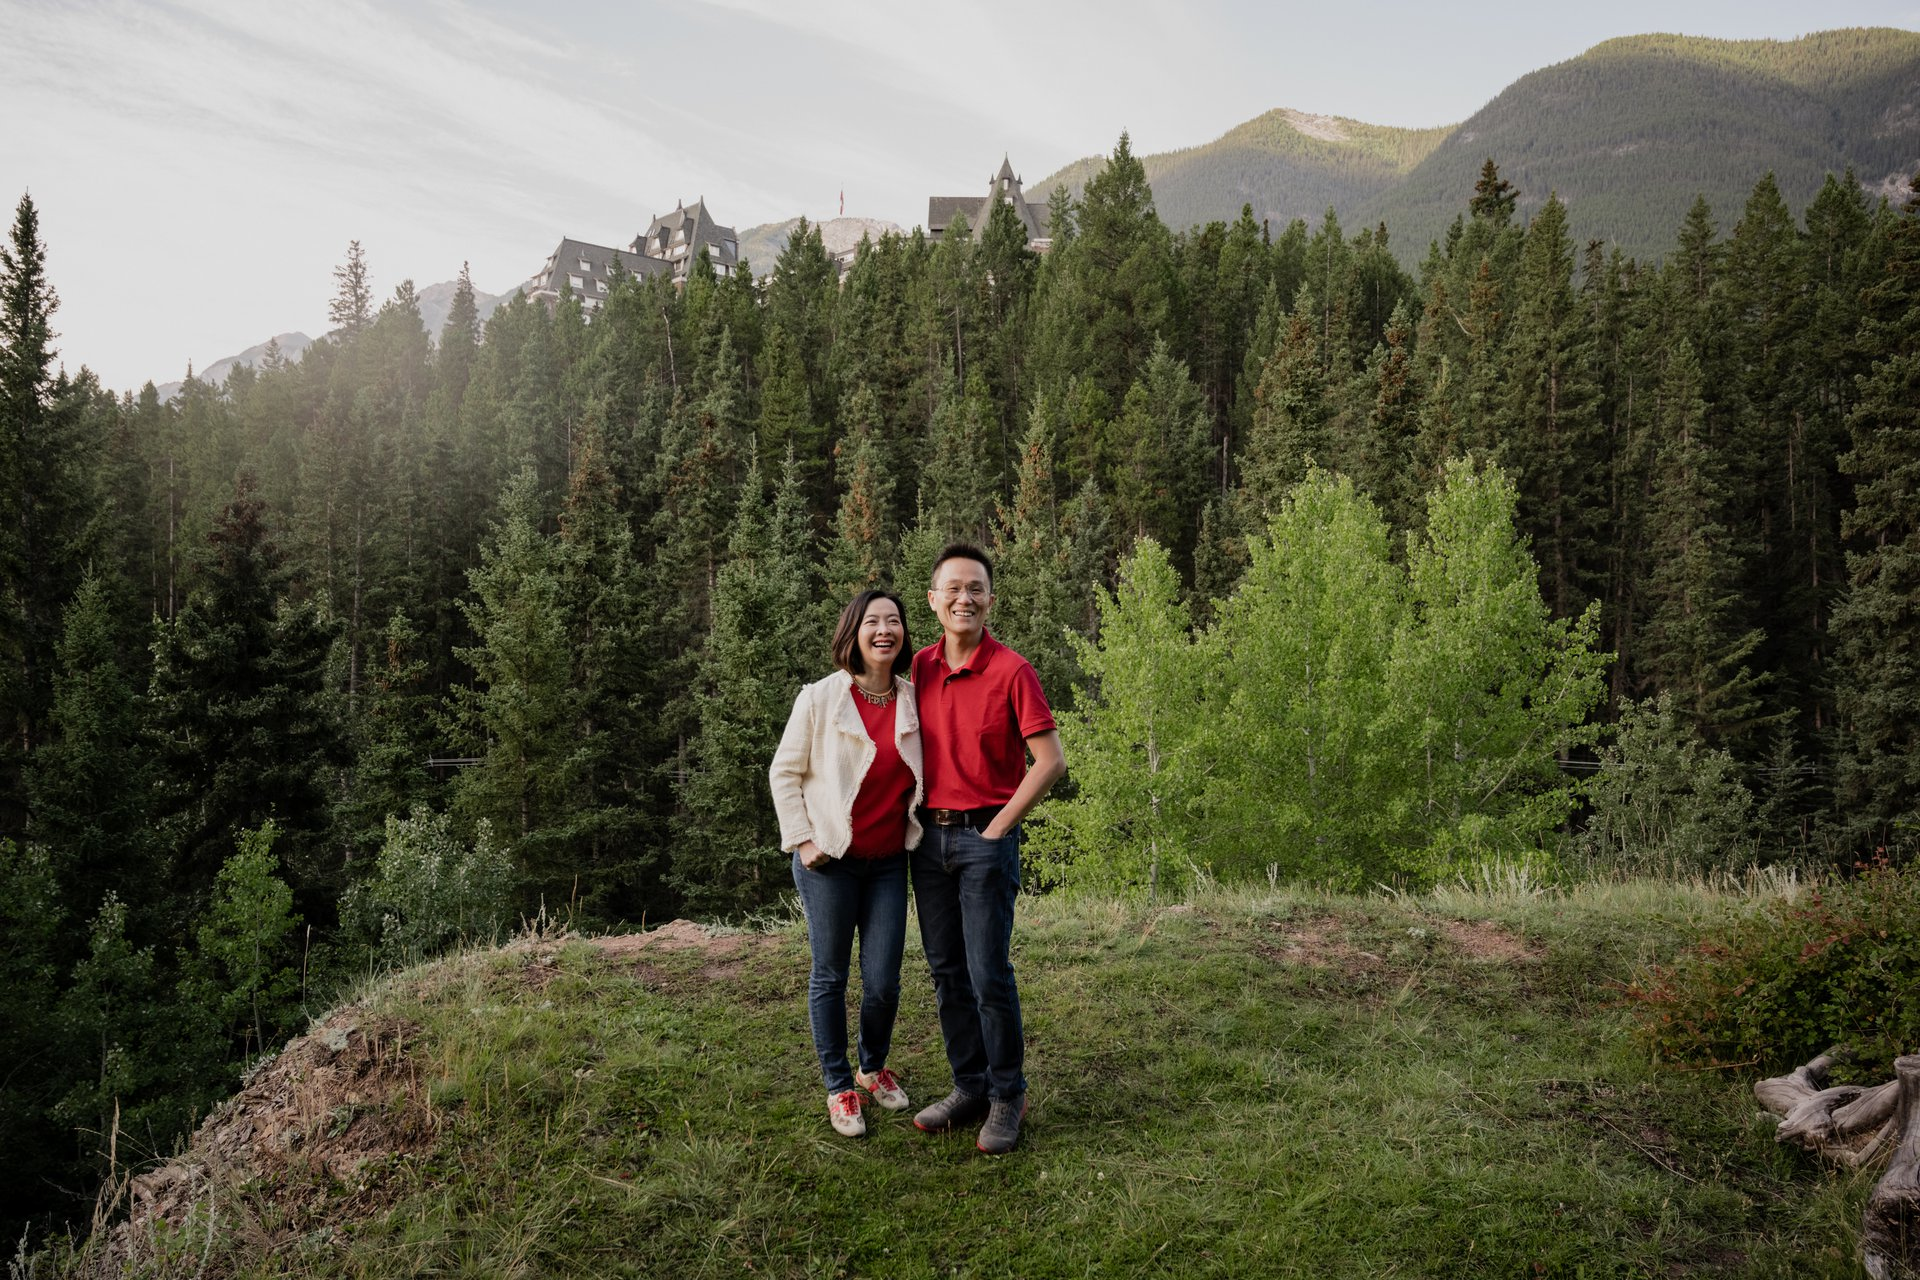 Flytographer Travel Story - Summer in Alberta 2019